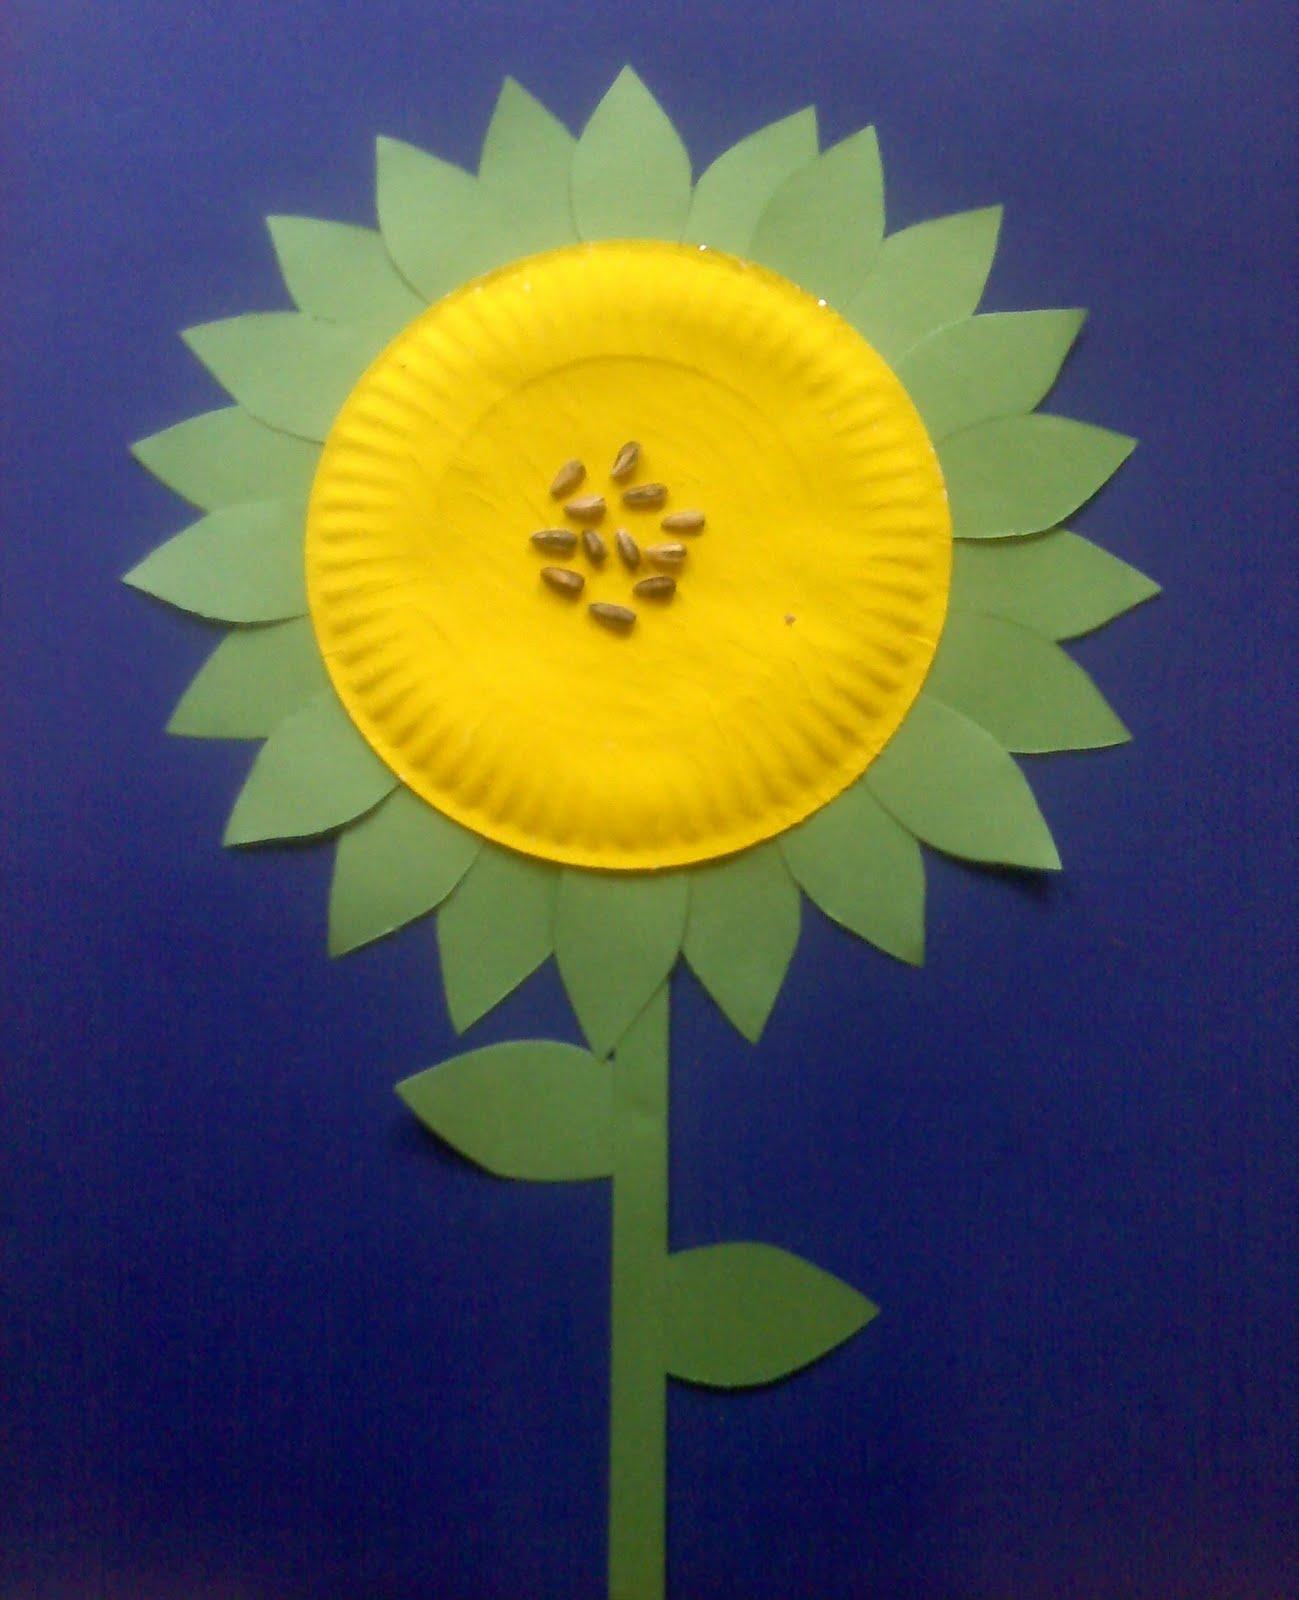 Sunflower \u2022Large paper plates \u2022yellow paint \u2022green construction paper \u2022 sunflower seeds & Crafts For Preschoolers: Spring Crafts/Cooking